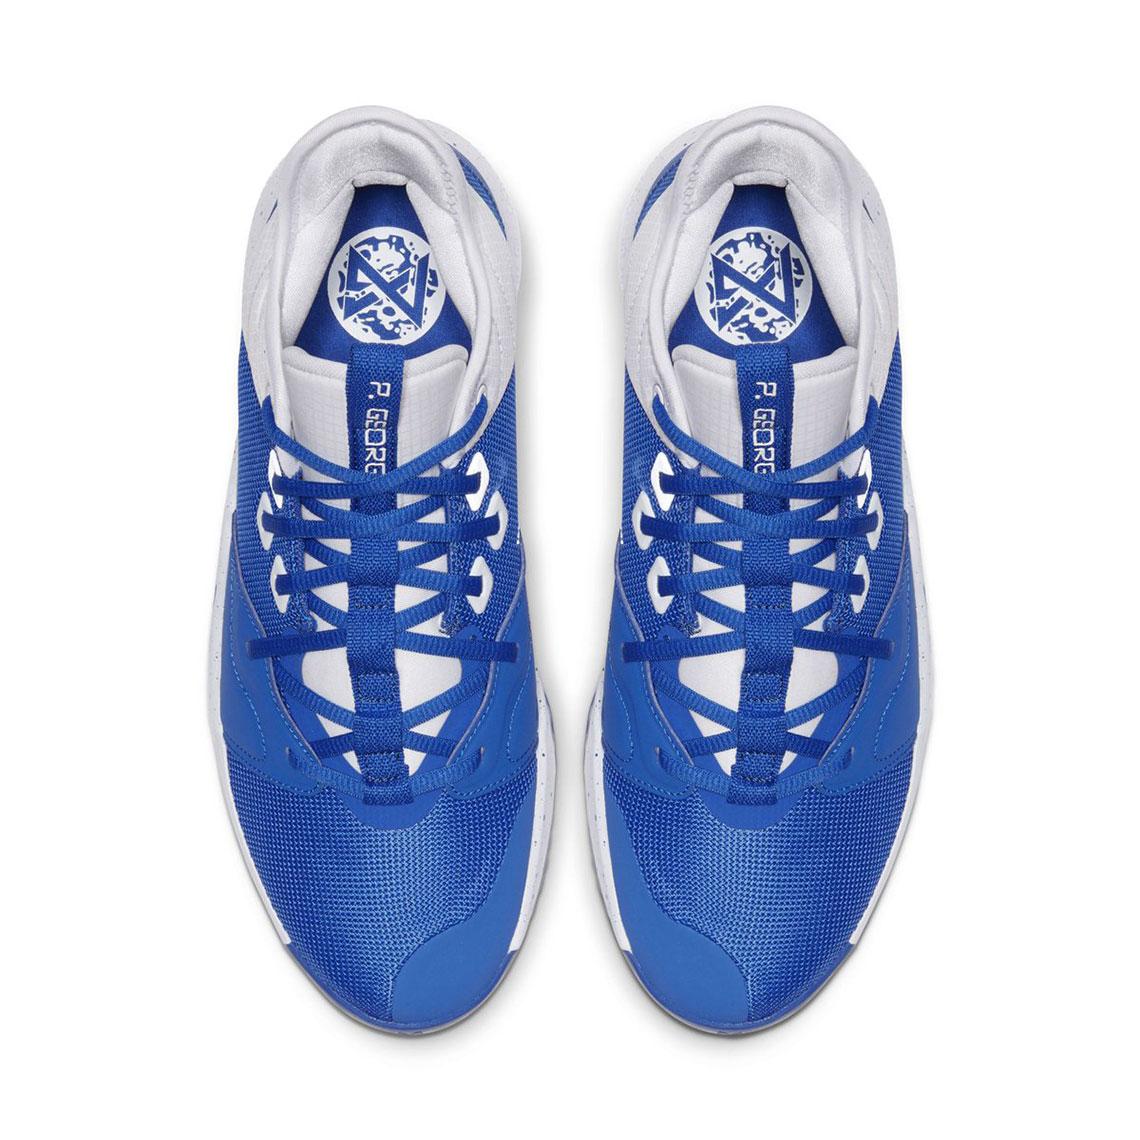 Nike PG3 TB - Release Info